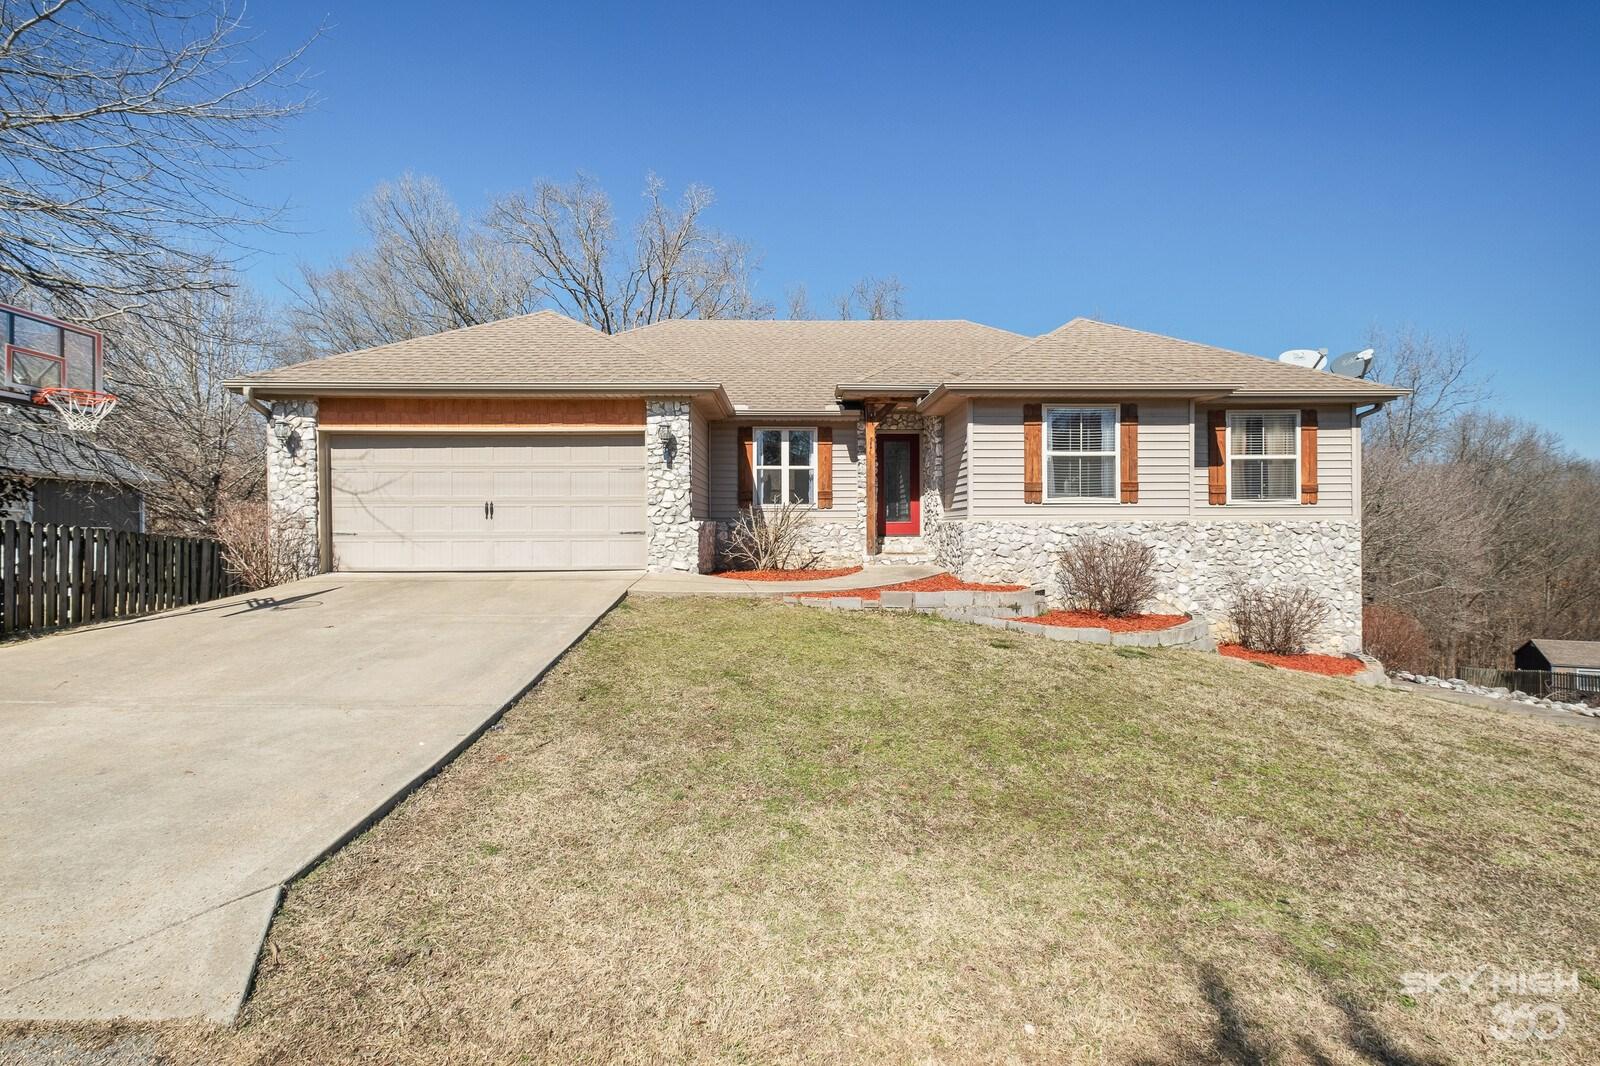 Updated Bella Vista Home for Sale Near Back 40 Trail